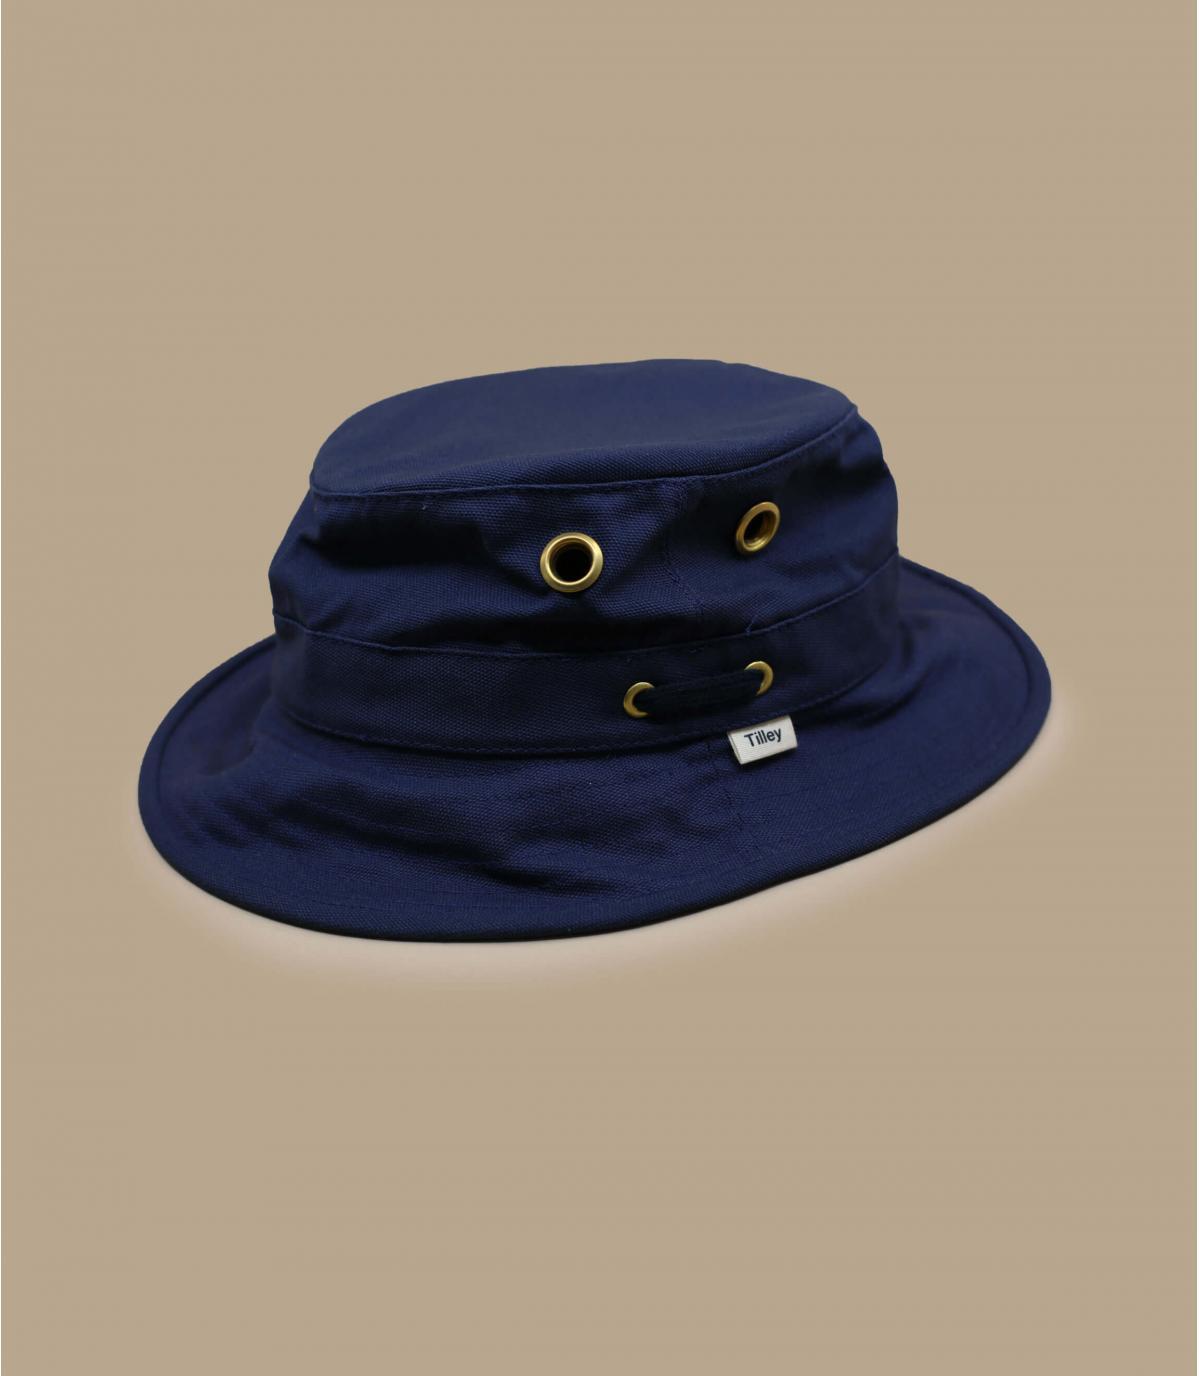 bob TilleyT1 blu marino